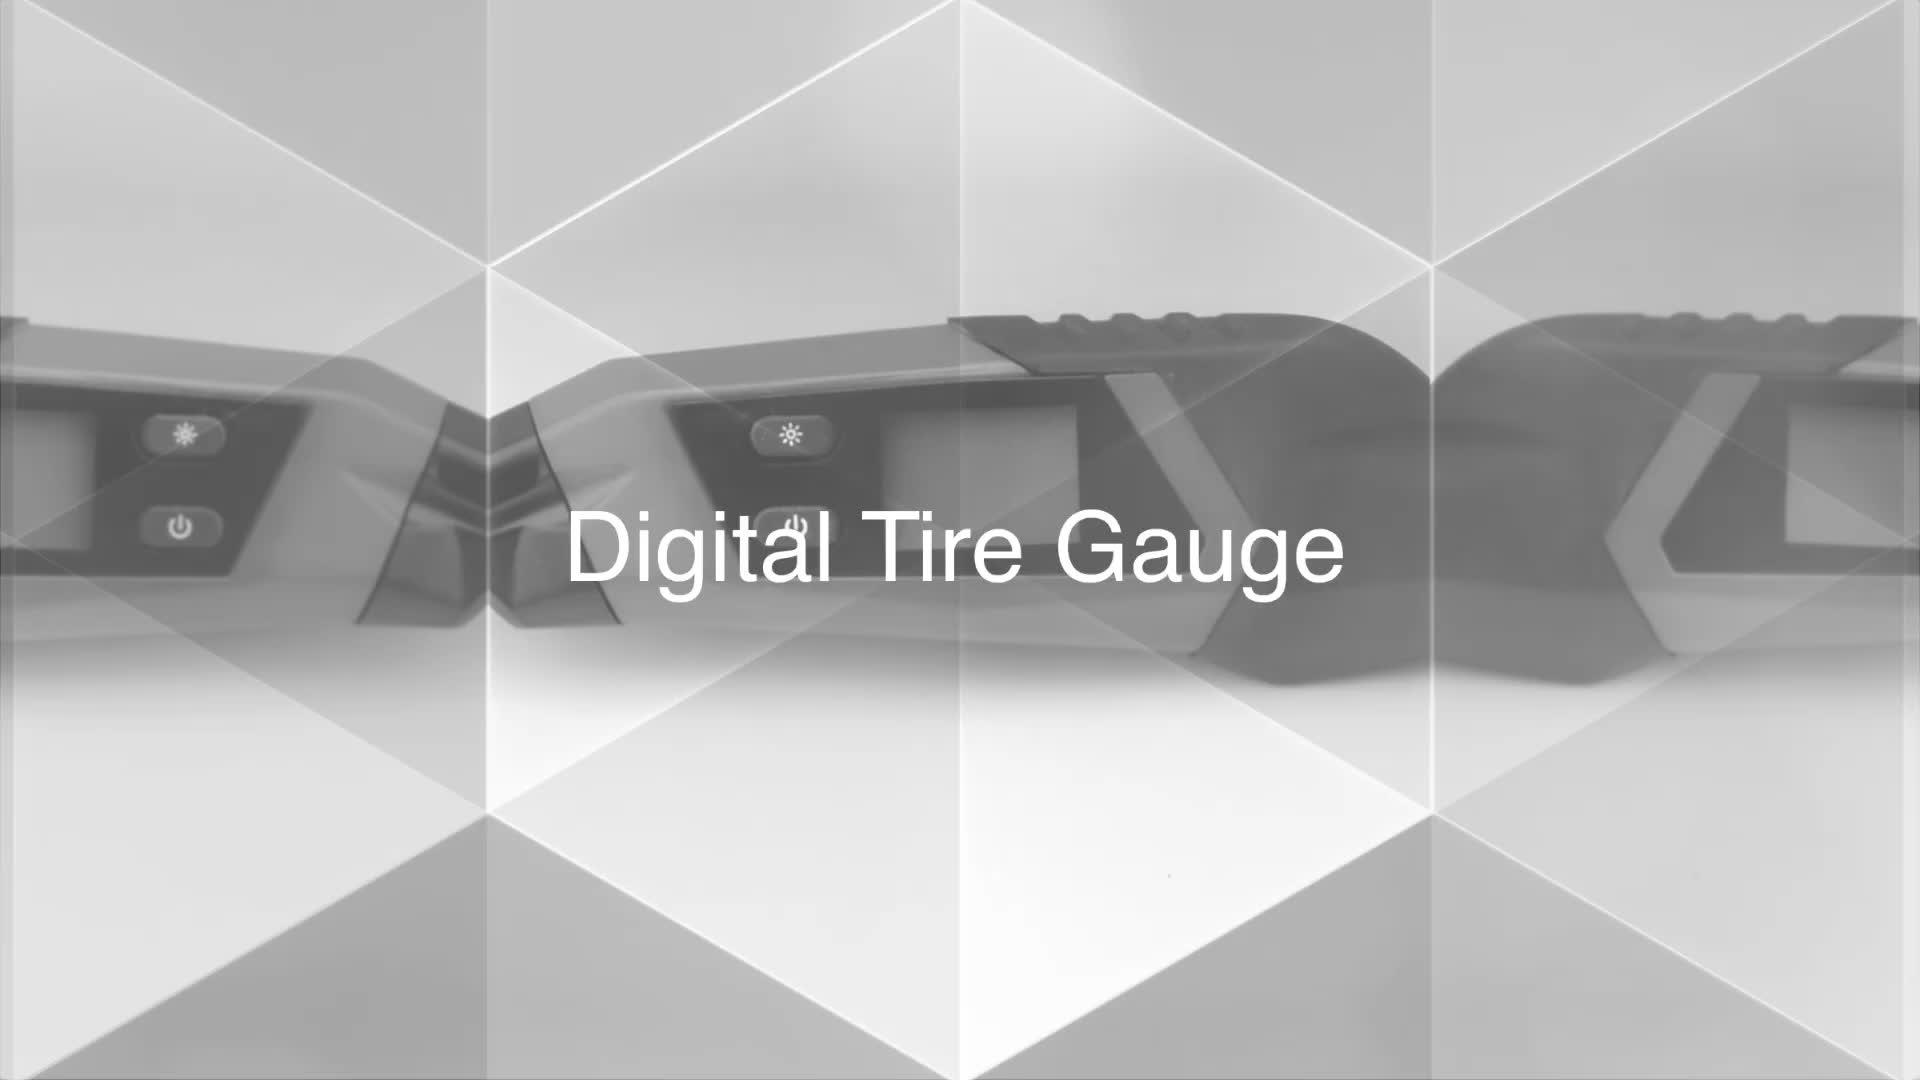 इलेक्ट्रॉनिक टायर प्लस डिजिटल टायर Inflator दबाव नापने का यंत्र